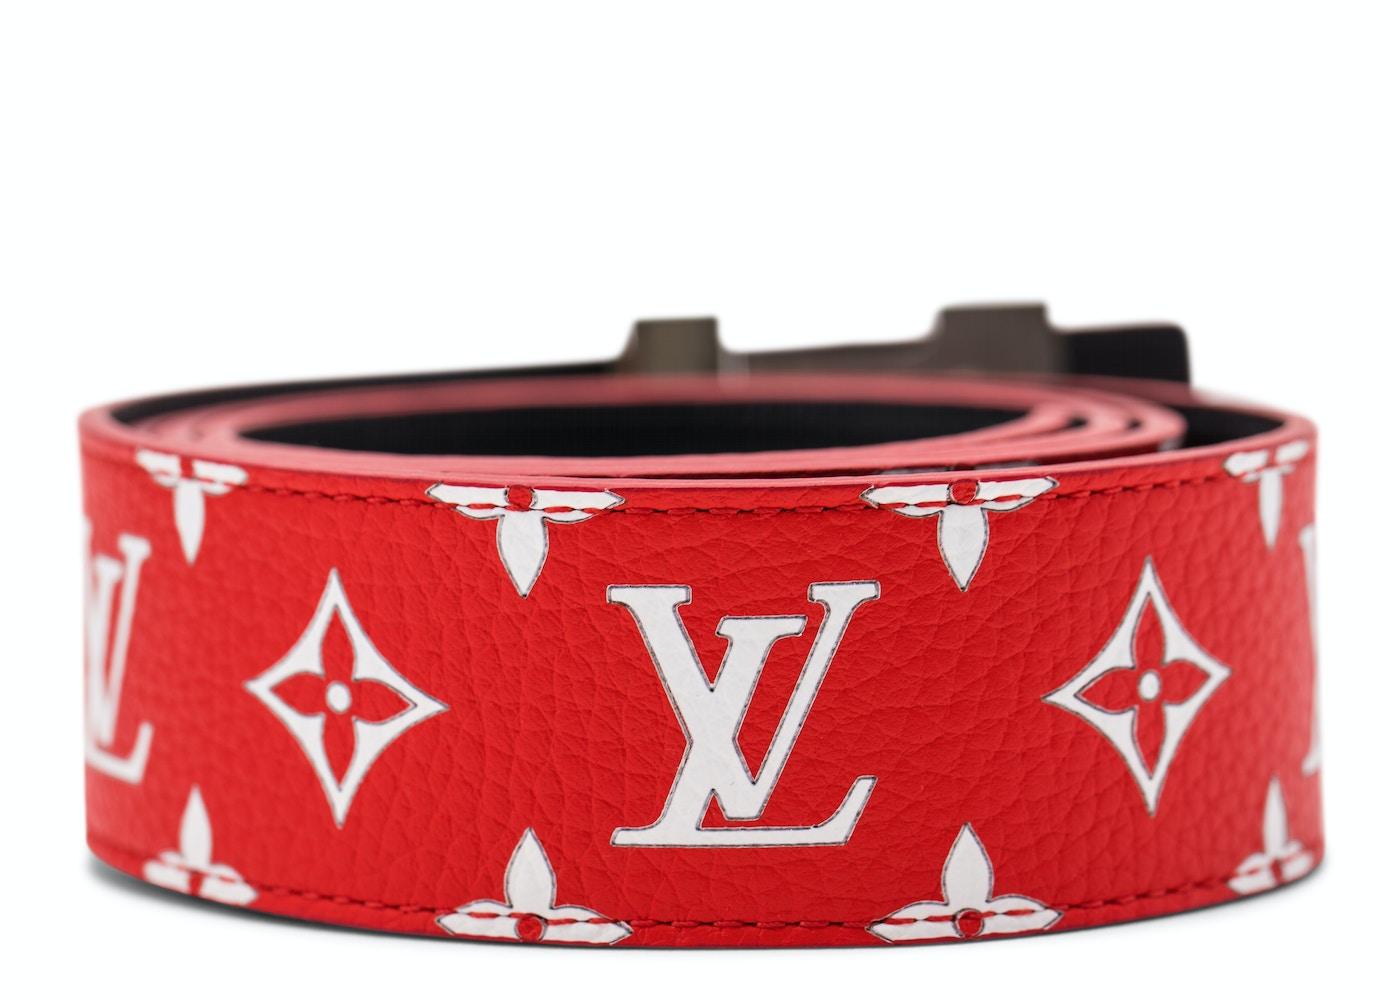 85ce42dec8da Louis Vuitton x Supreme Initiales Belt 40 MM Monogram Red